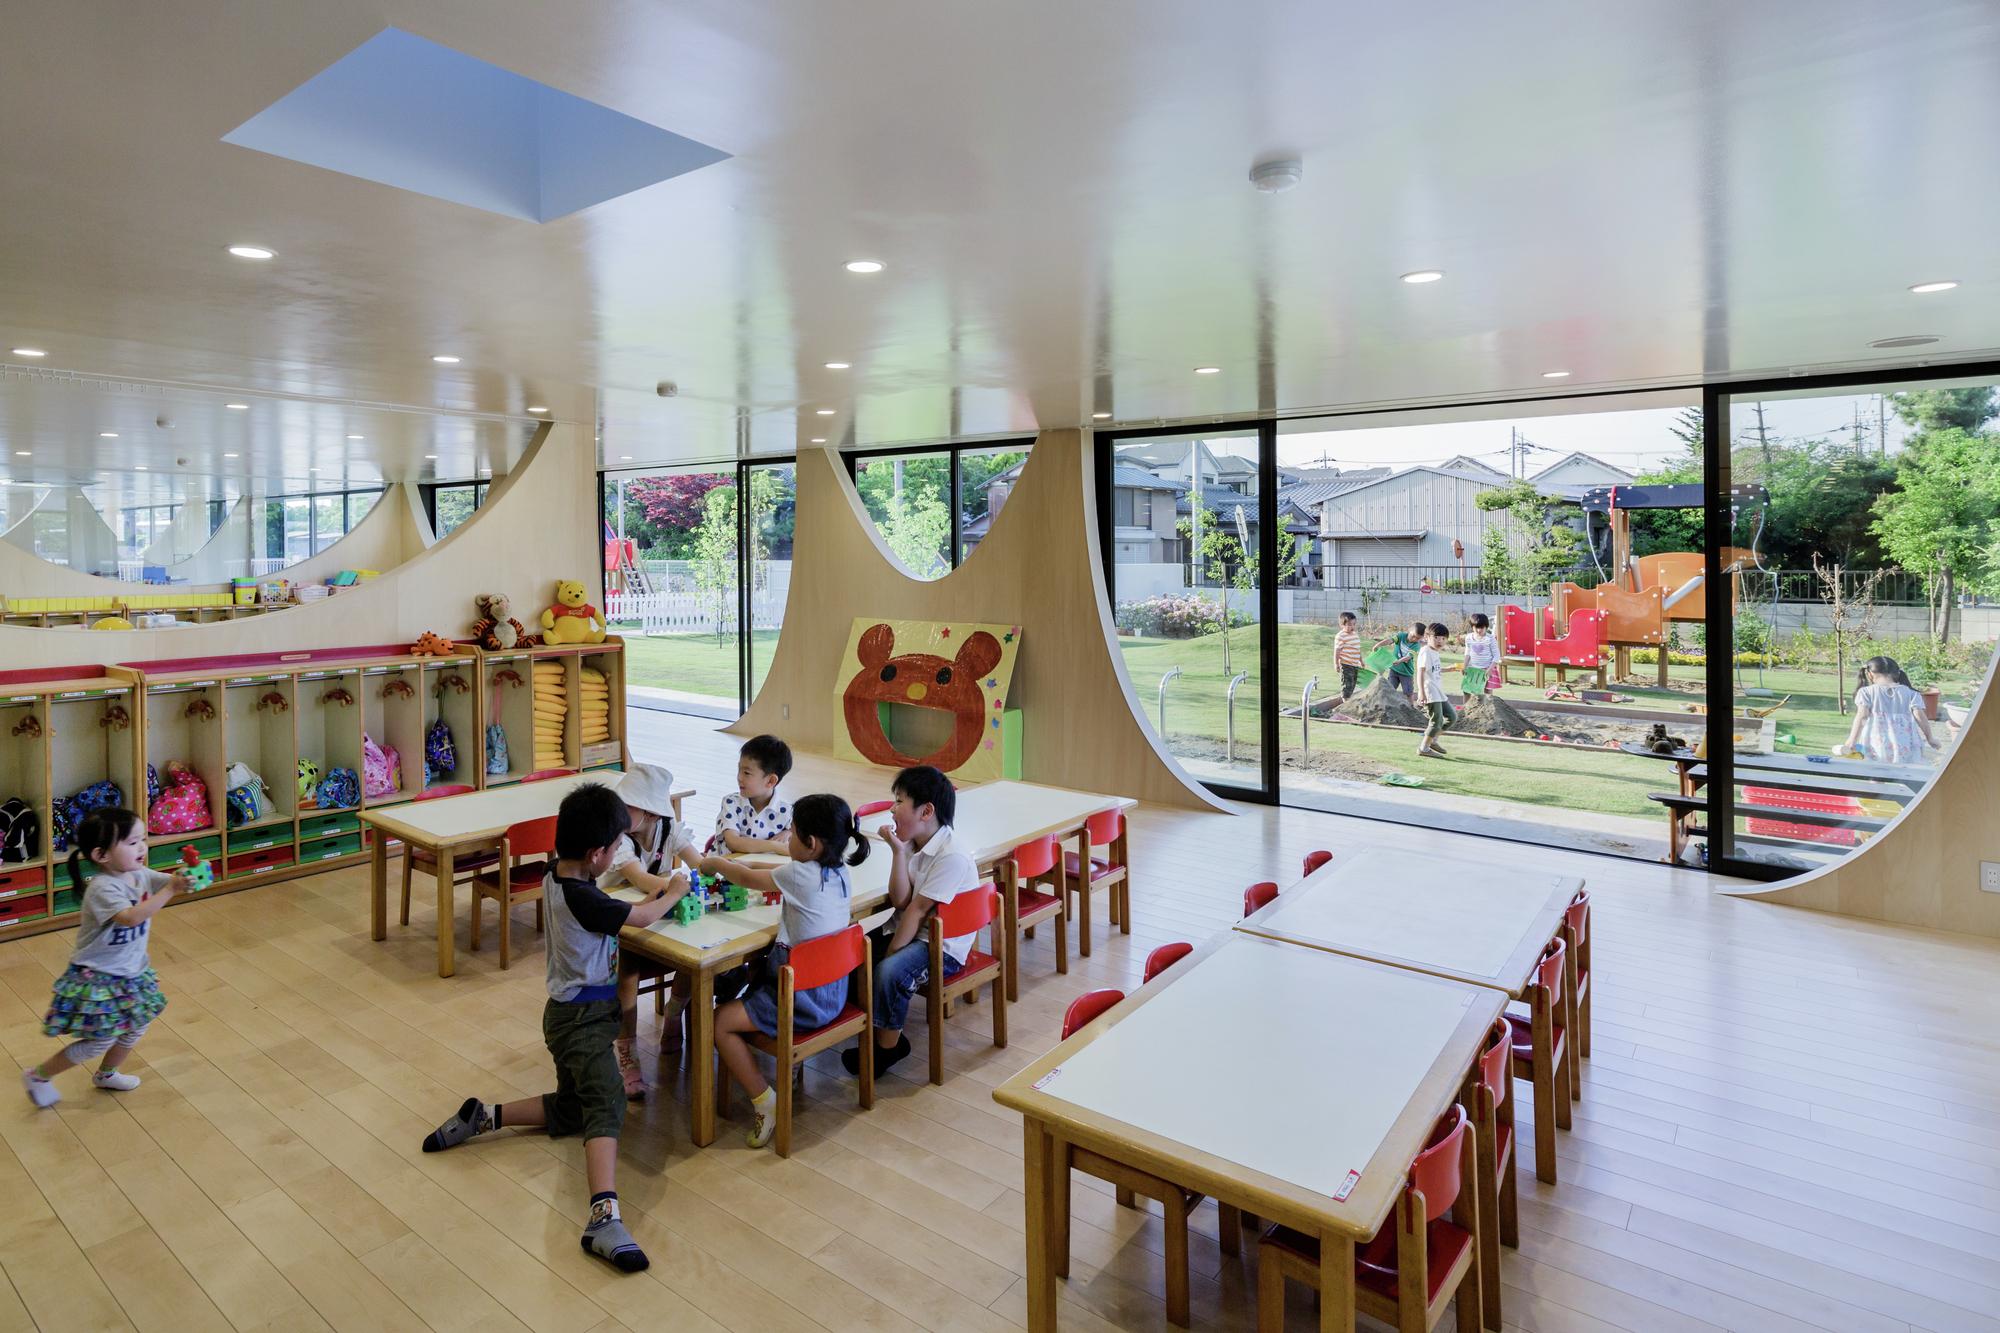 Jardines de infantes p blicos y comida saludable ejes del for Jardin de infantes